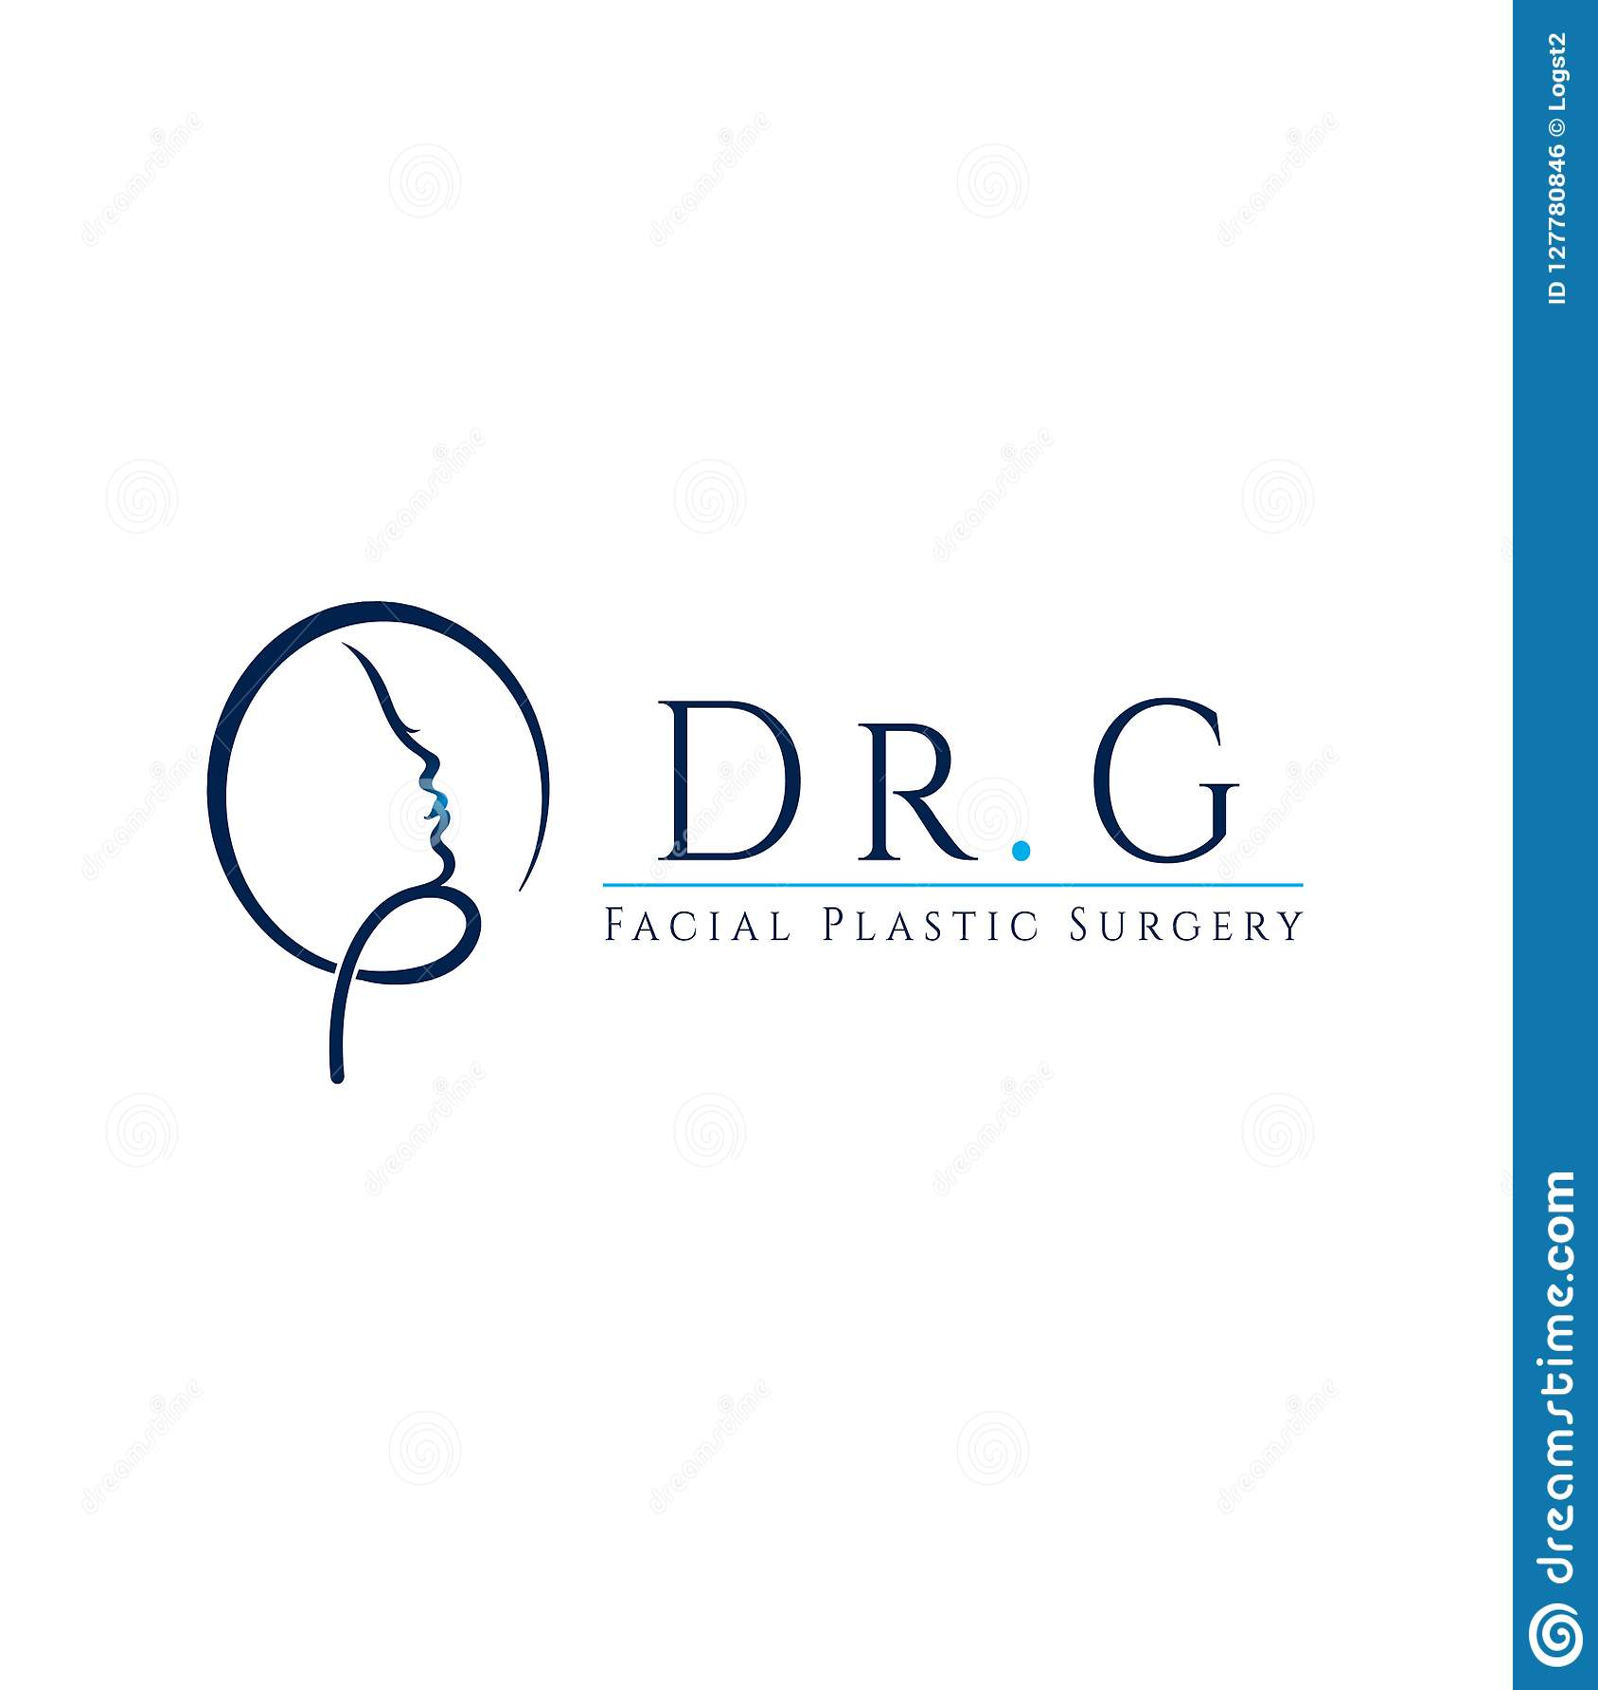 Plastic Surgeon Vector Logo Stock Vector Illustration Of Aesthetics Design 127780846